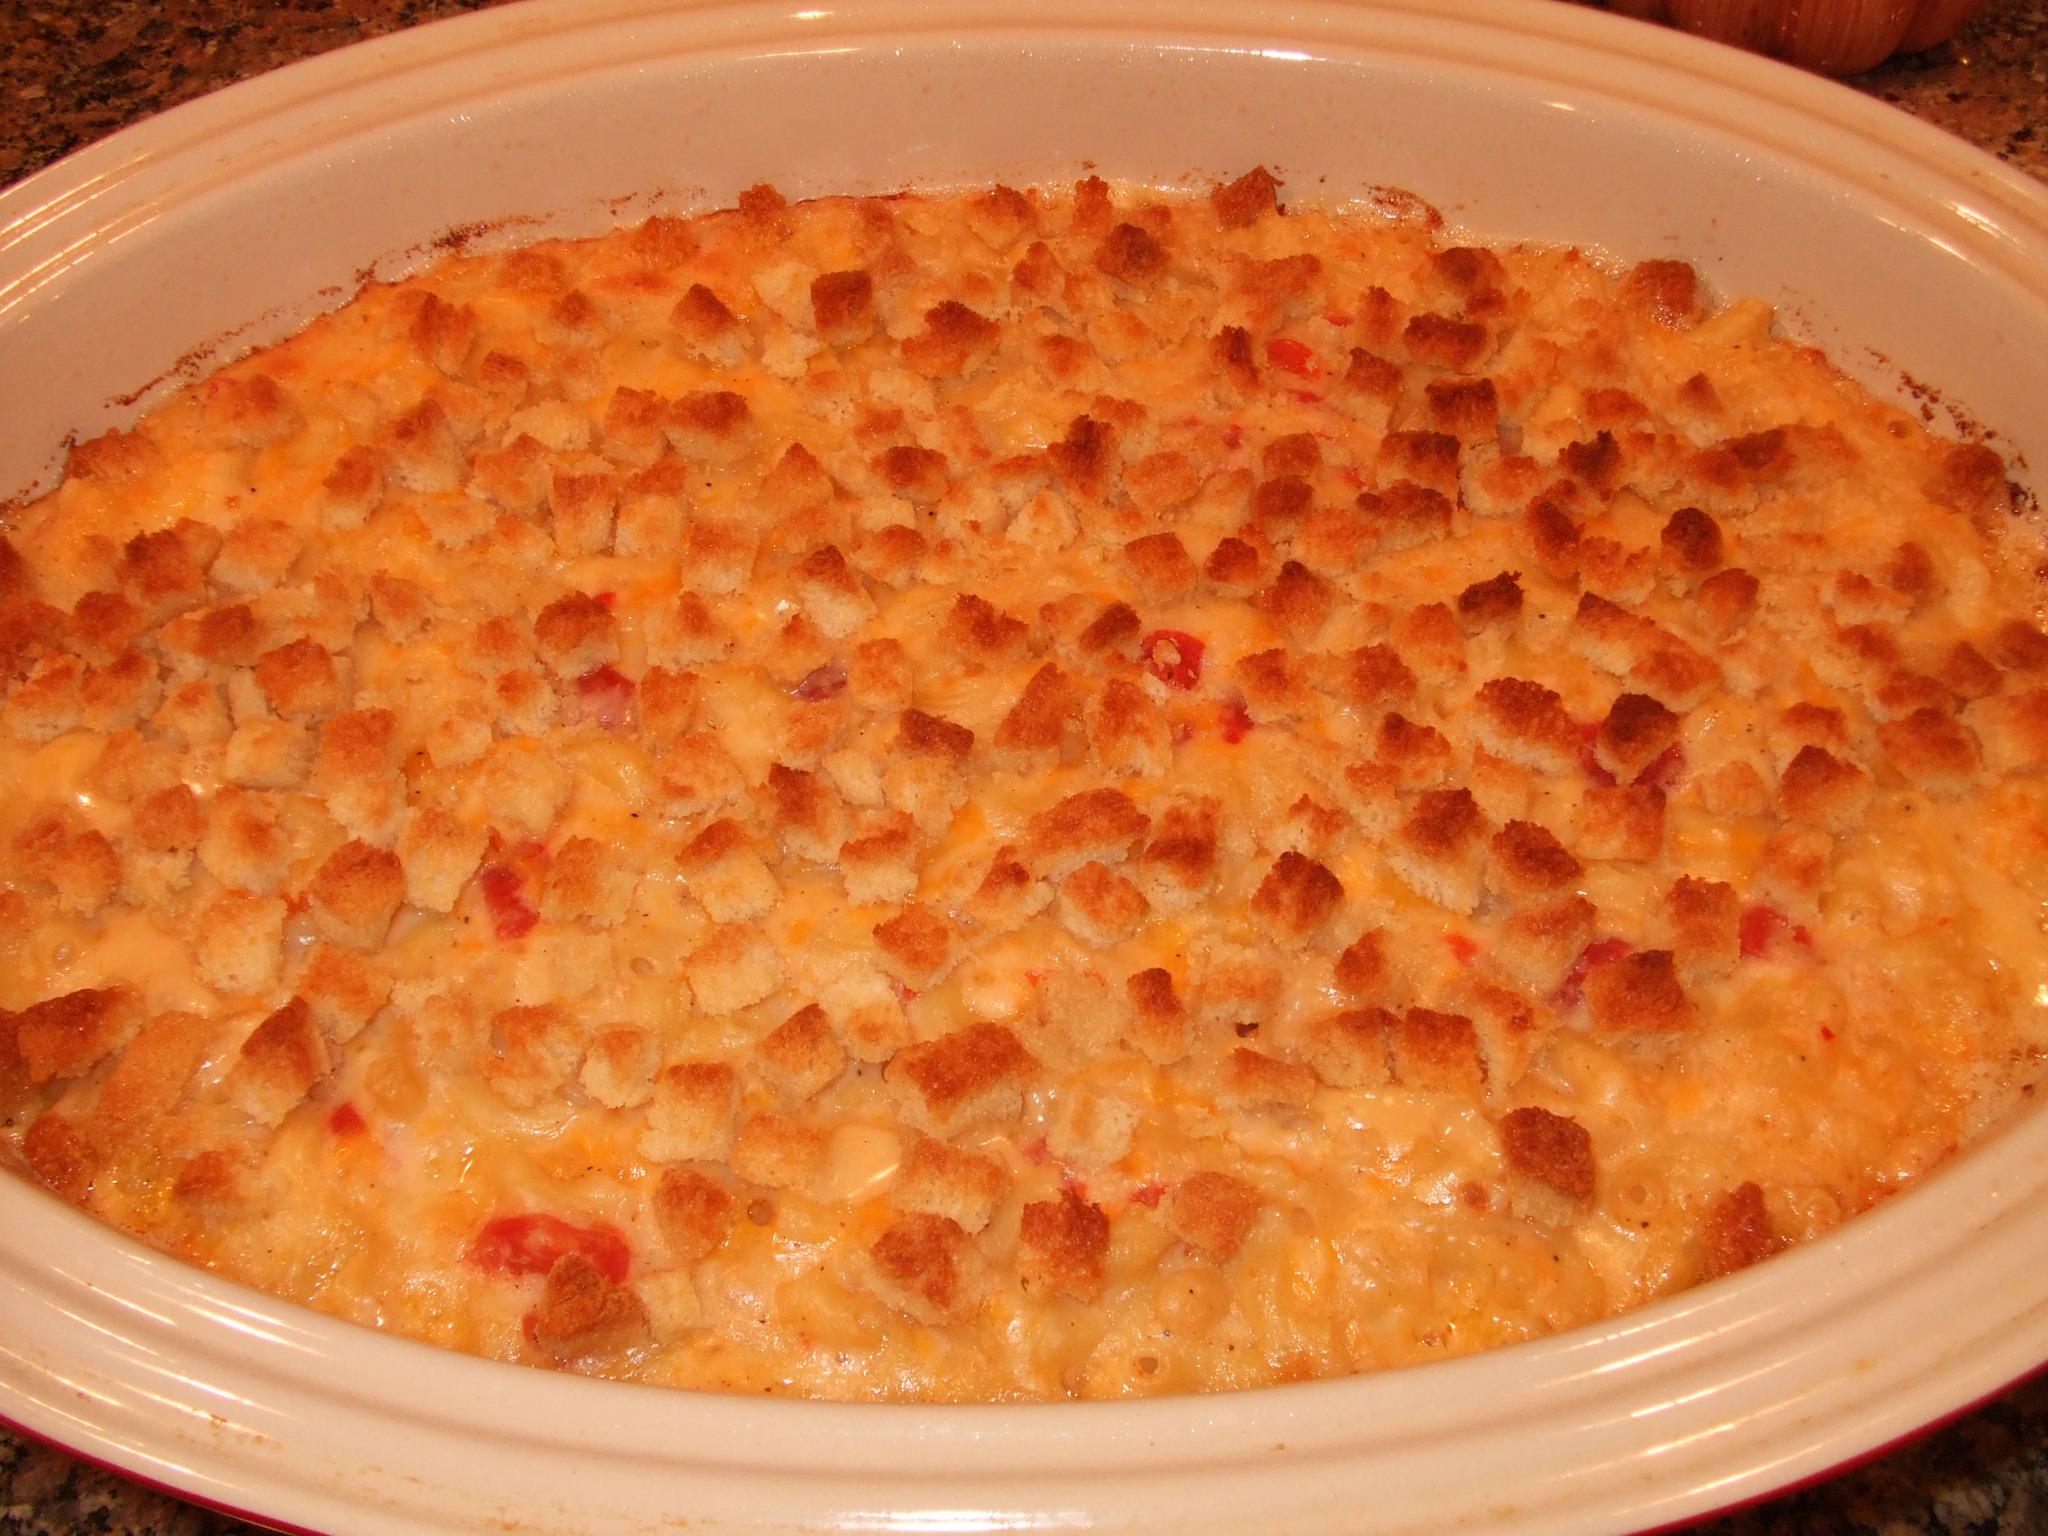 Macaroni And Cheese From Ina Garten Barefoot Contessa Macaroni And Cheese From Ina Garten Barefoot Contessa